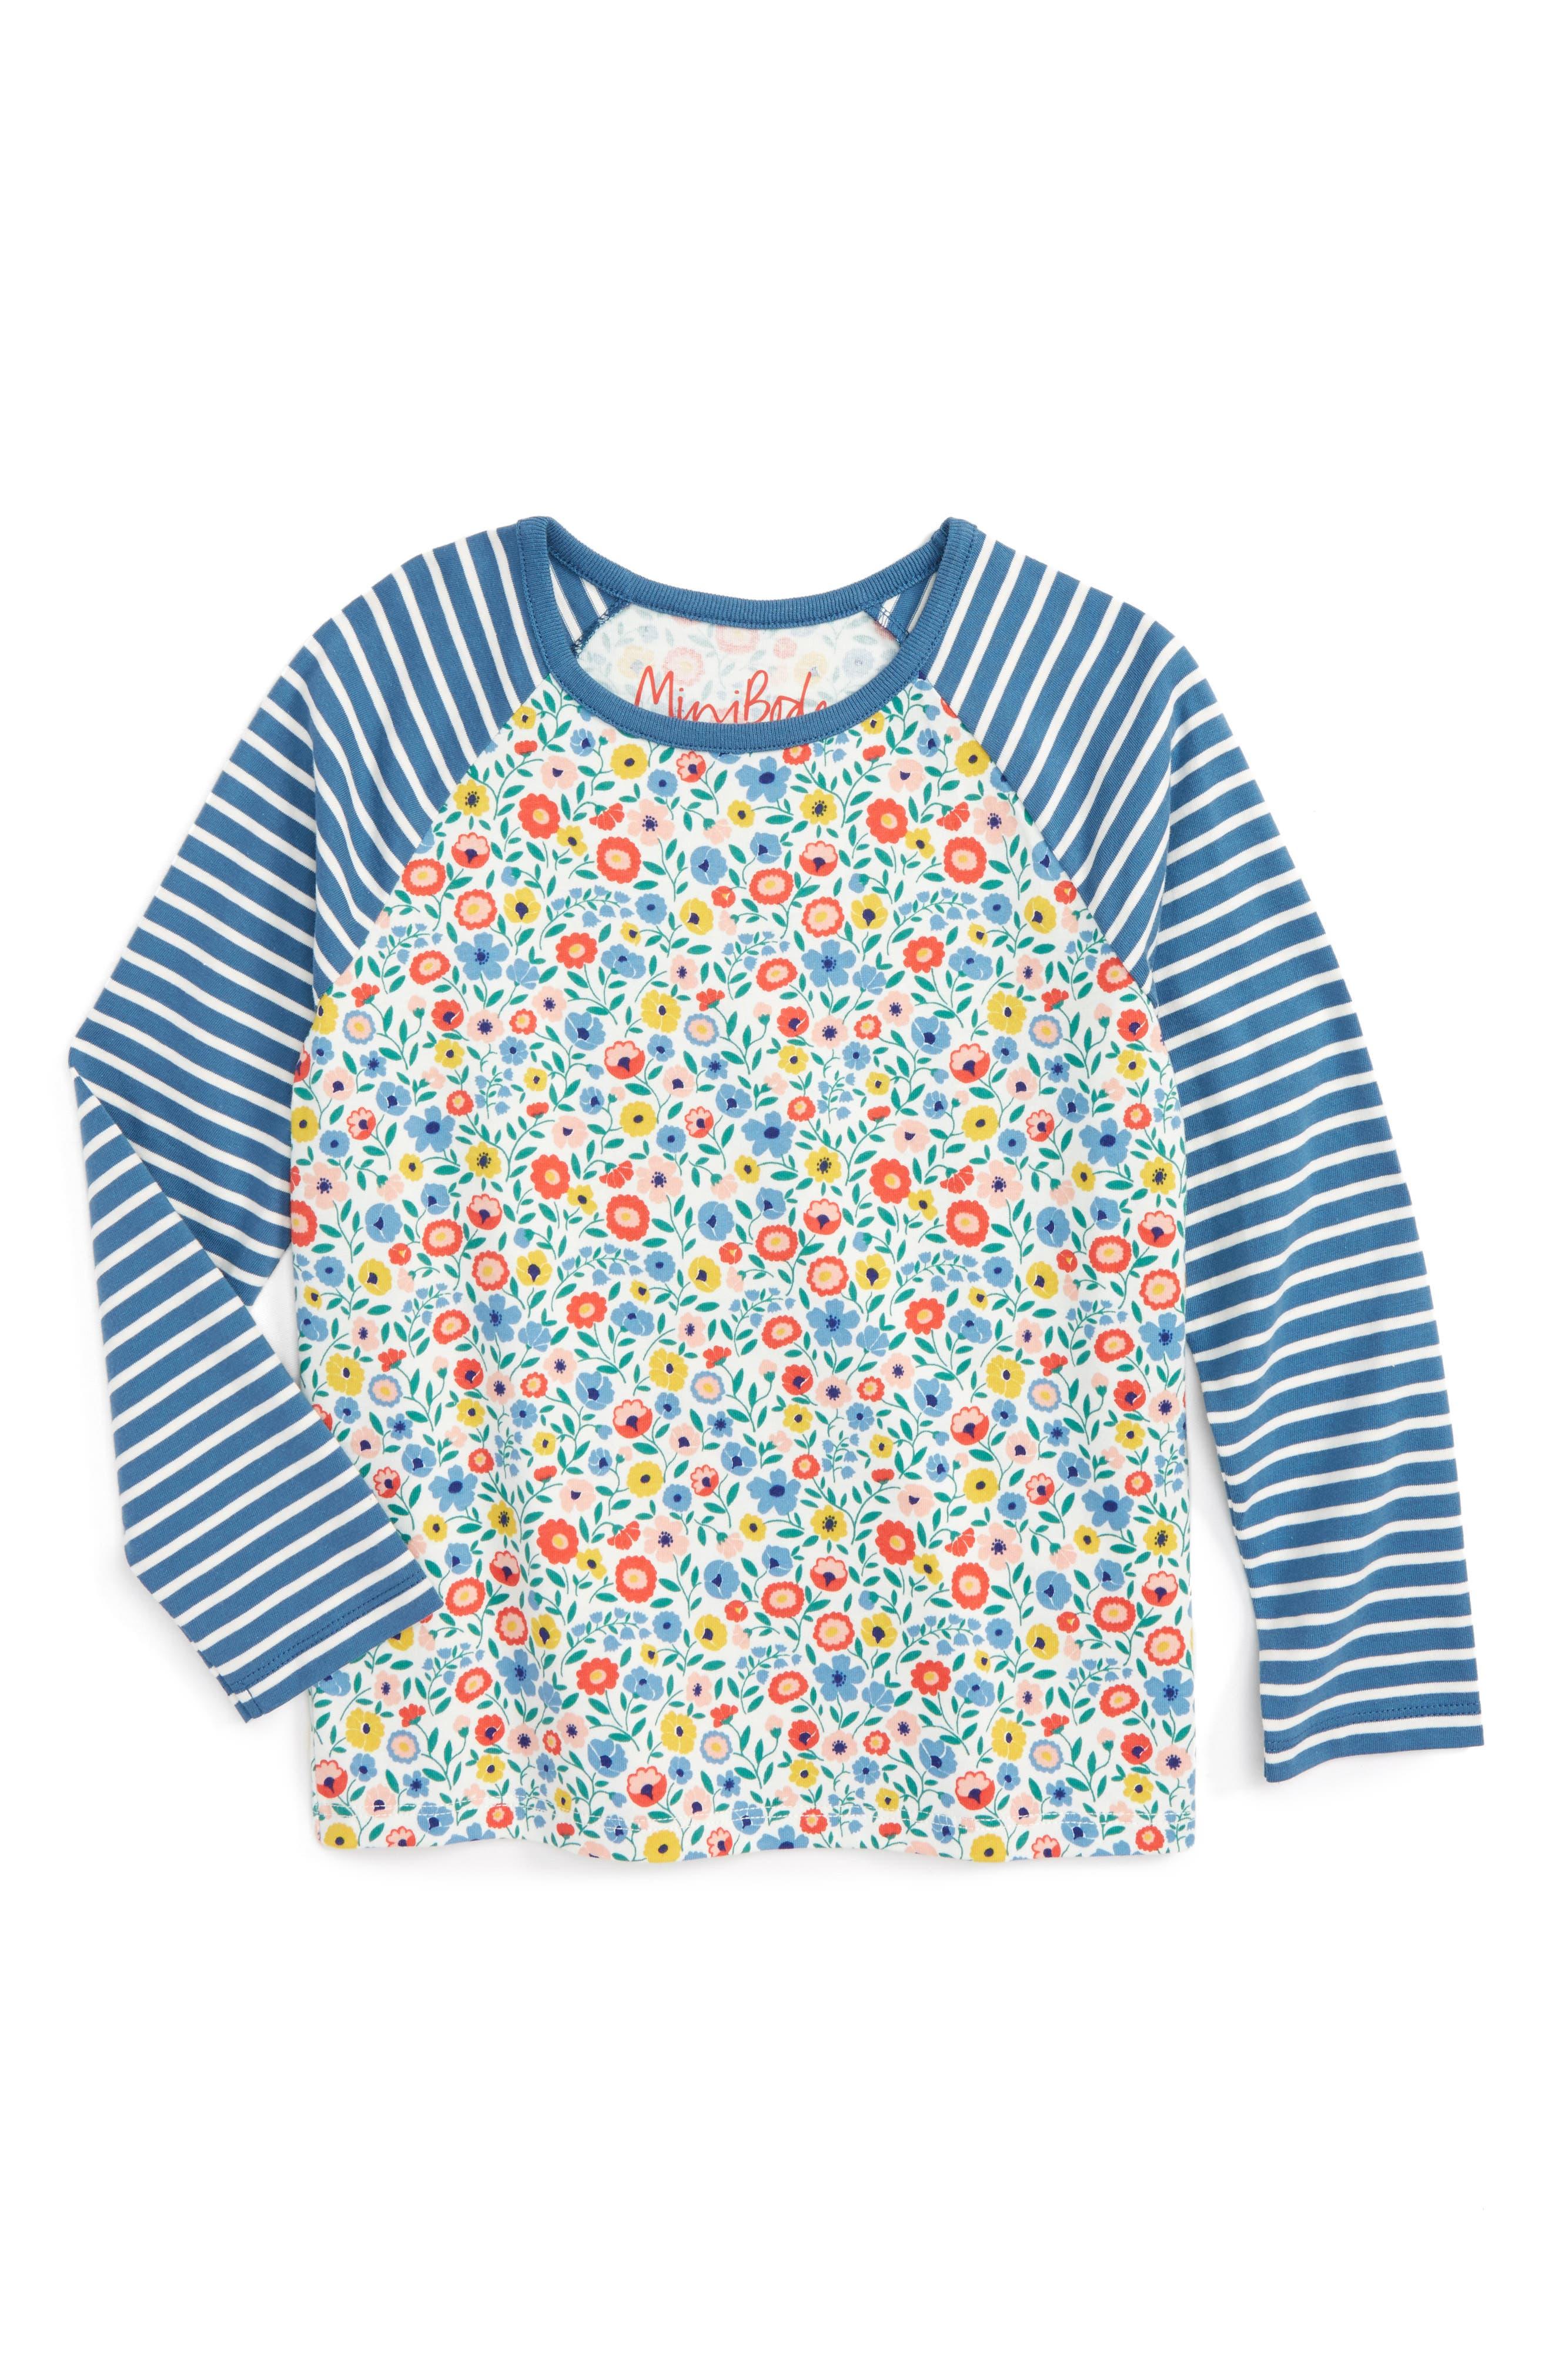 Alternate Image 1 Selected - Mini Boden Hotchpotch Tee (Toddler Girls, Little Girls & Big Girls)